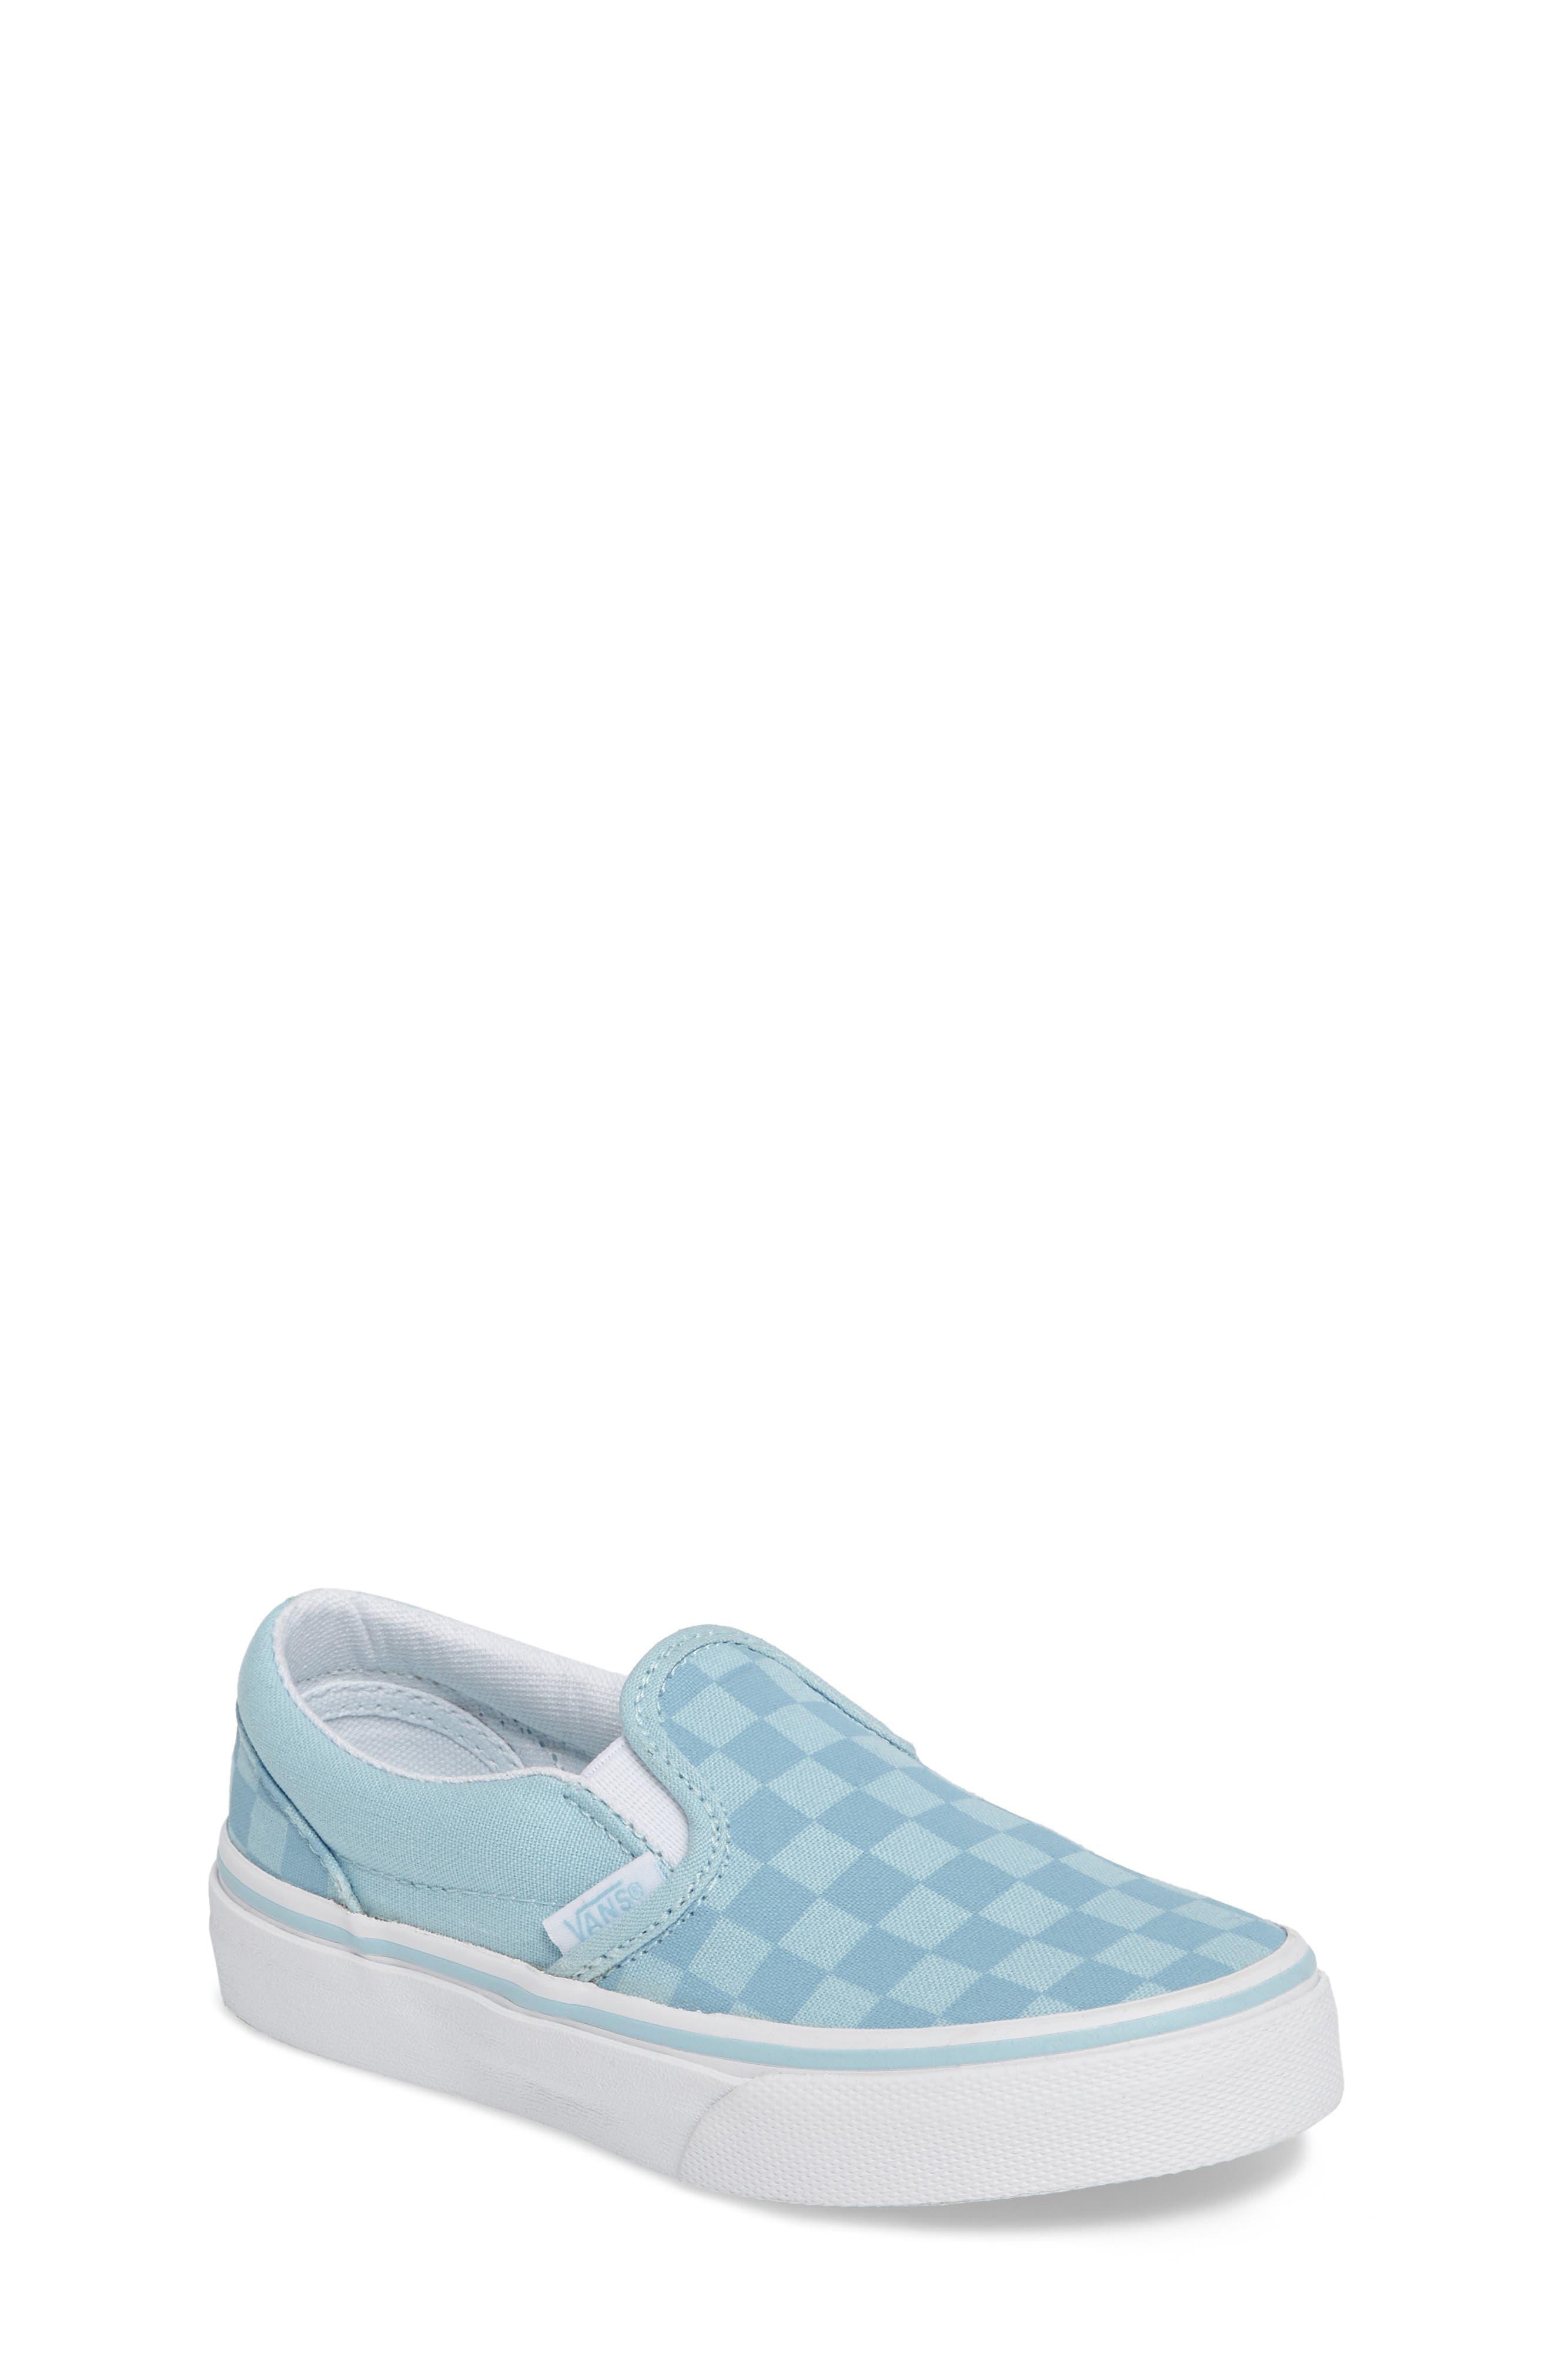 Classic Slip-On Sneaker,                             Main thumbnail 1, color,                             Crystal Blue Tonal Check